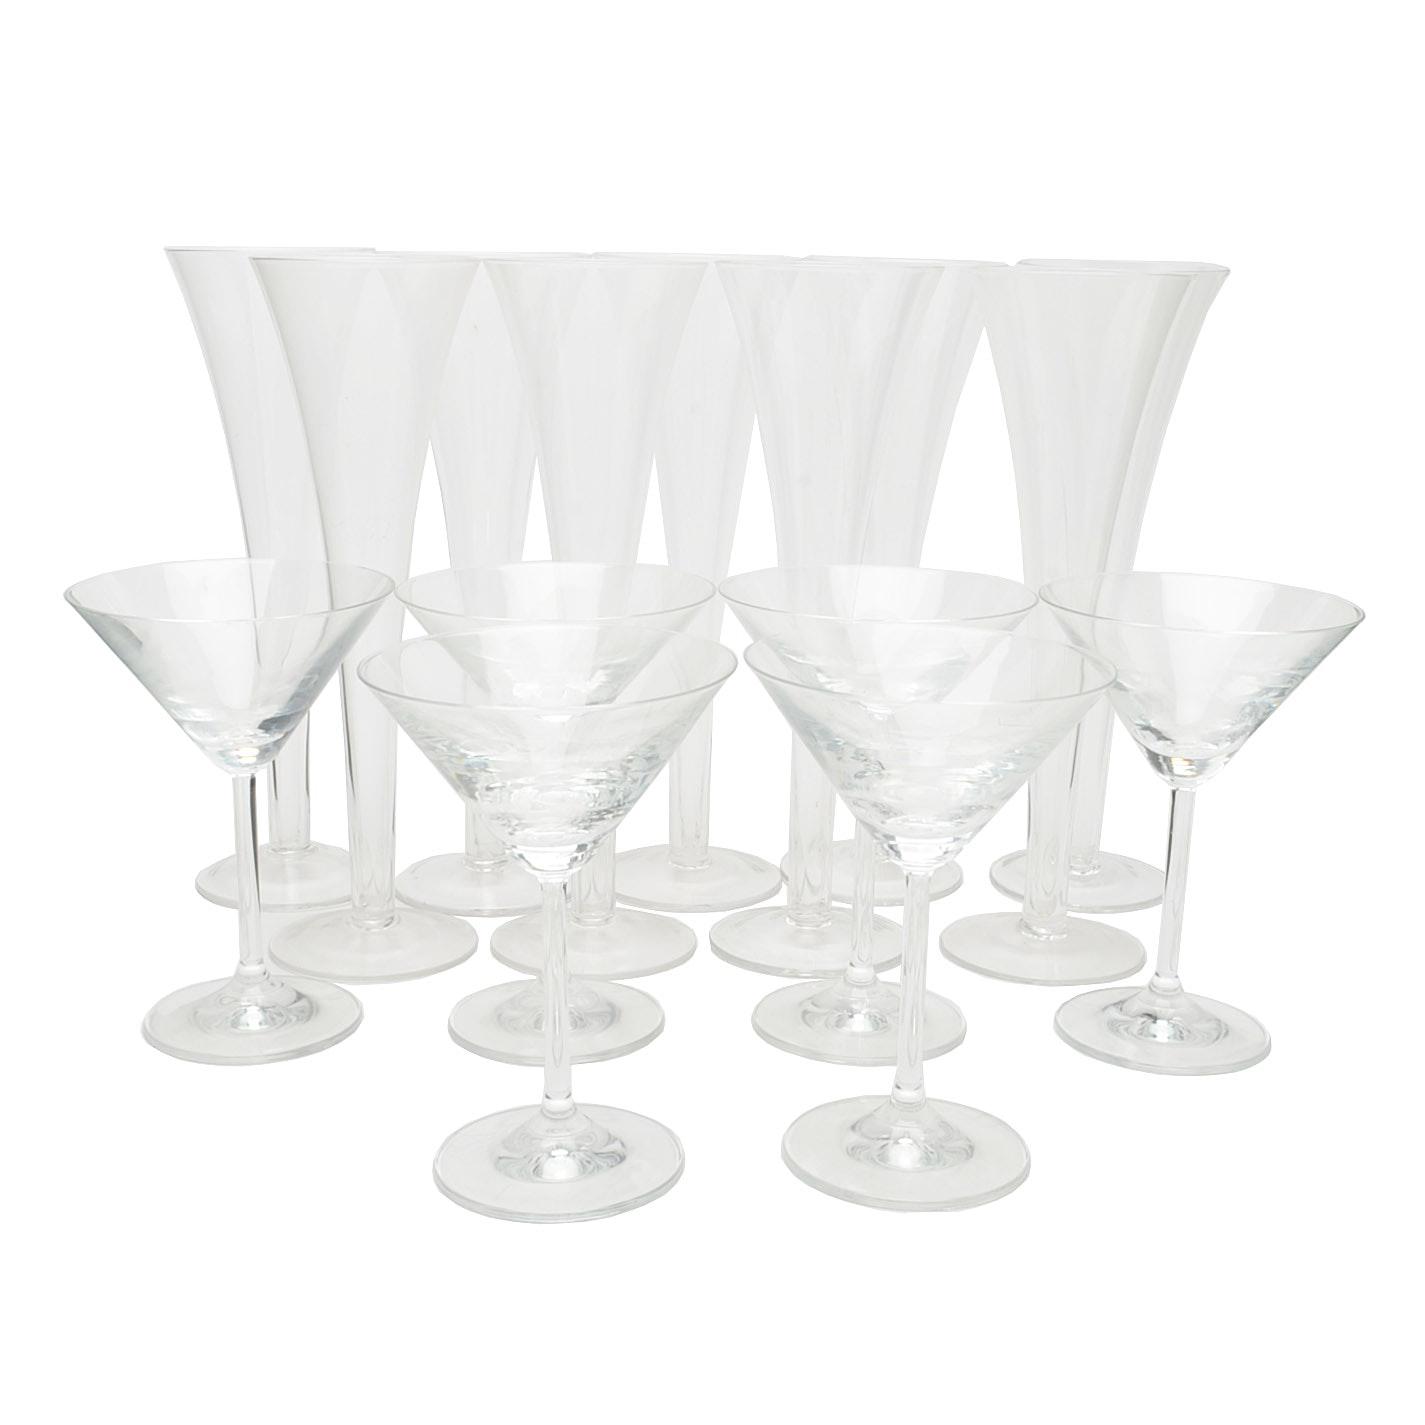 Sparkling Wine Flutes and Martini Glasses